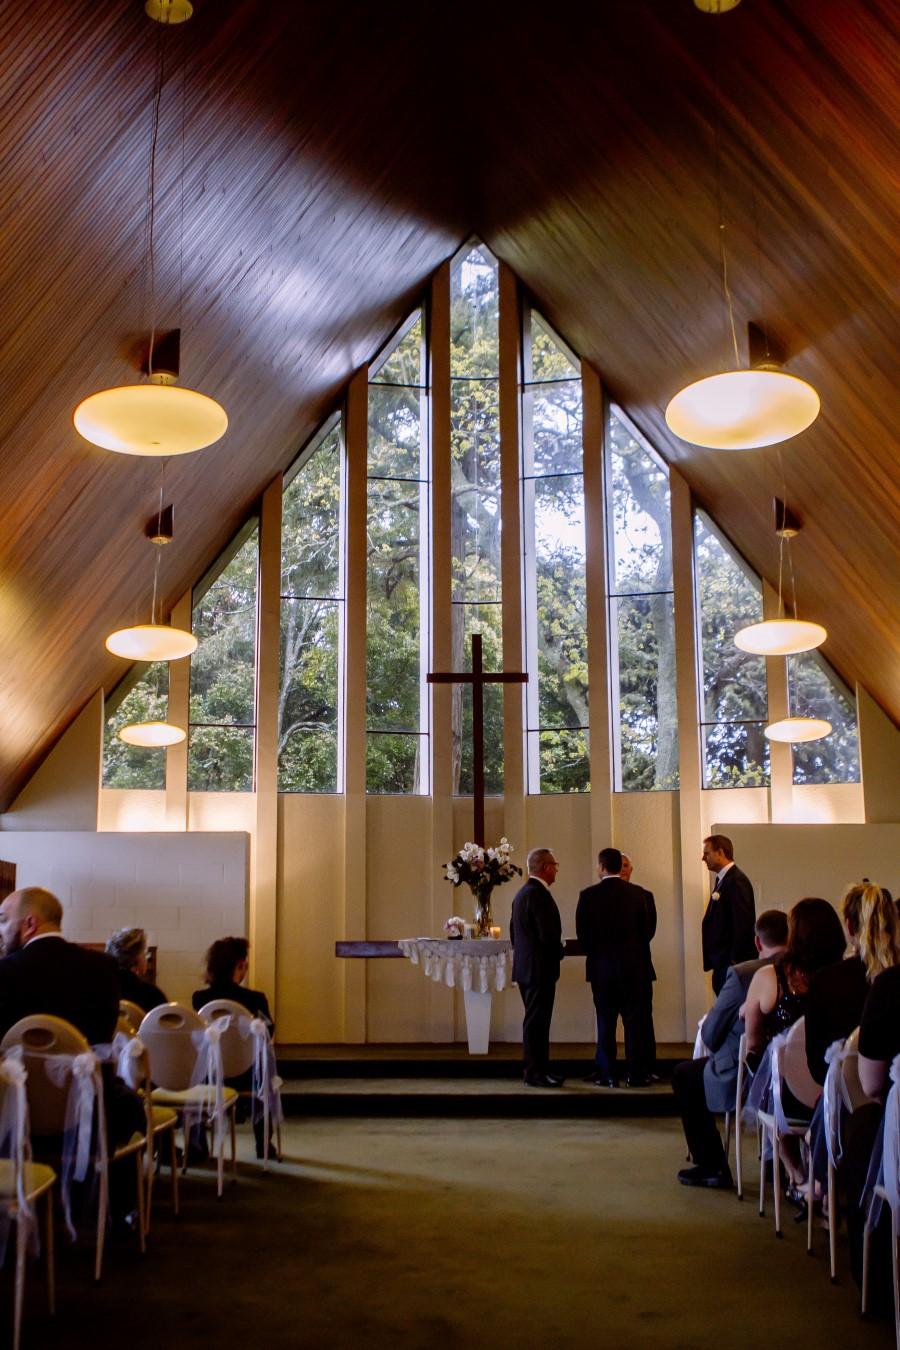 nz_wedding_st_leonards_mchughs-62